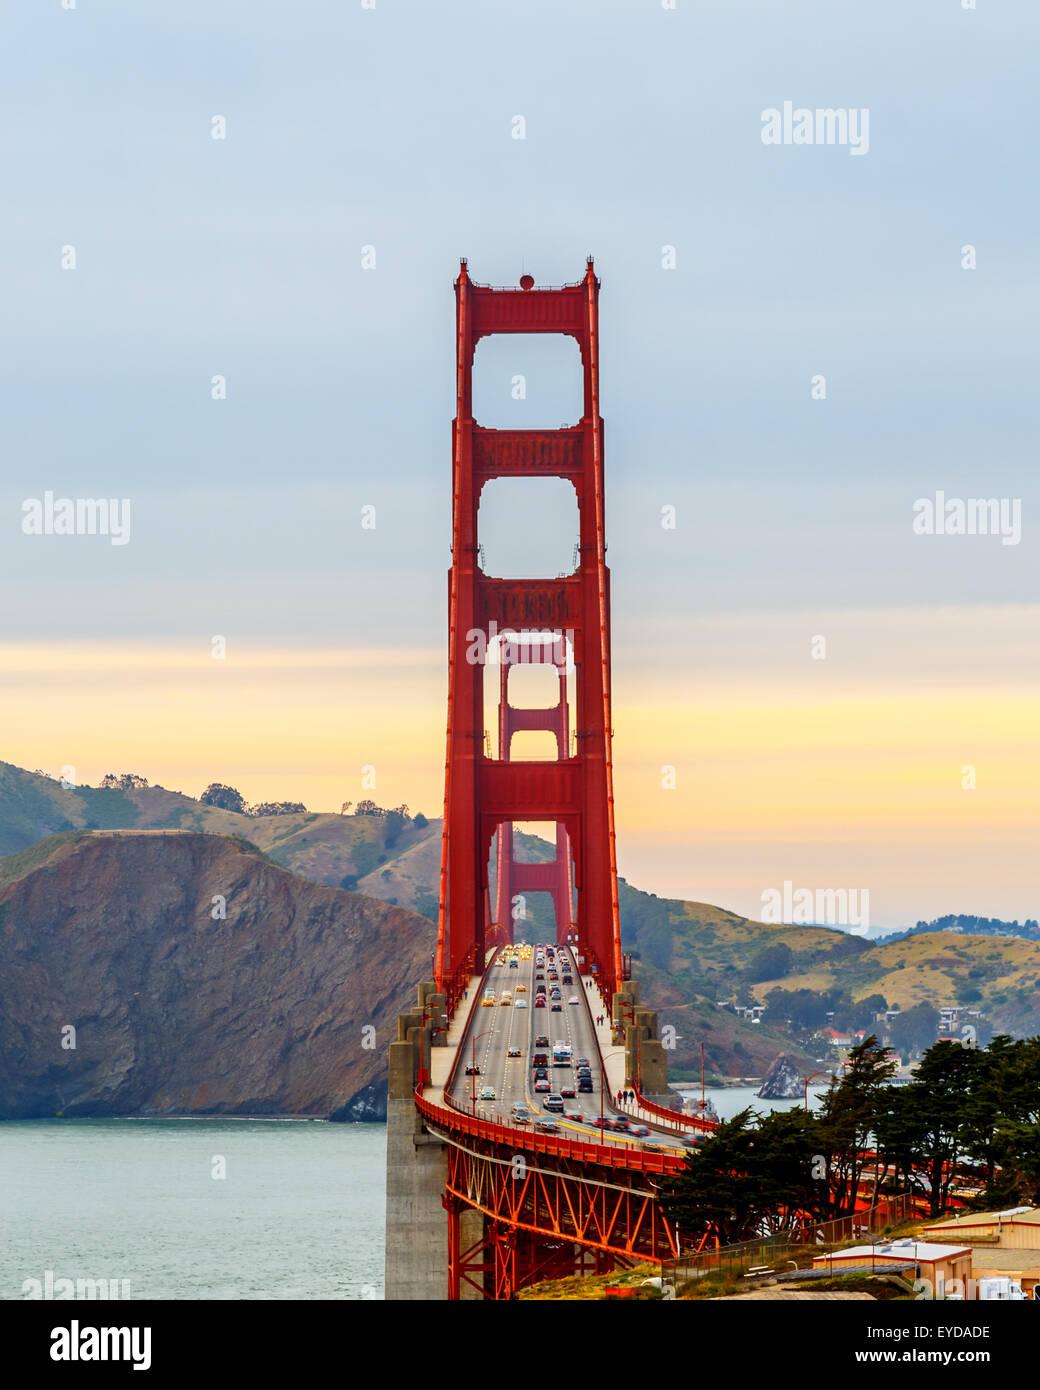 San Francisco Golden Gate Bridge at sunset - Stock Image